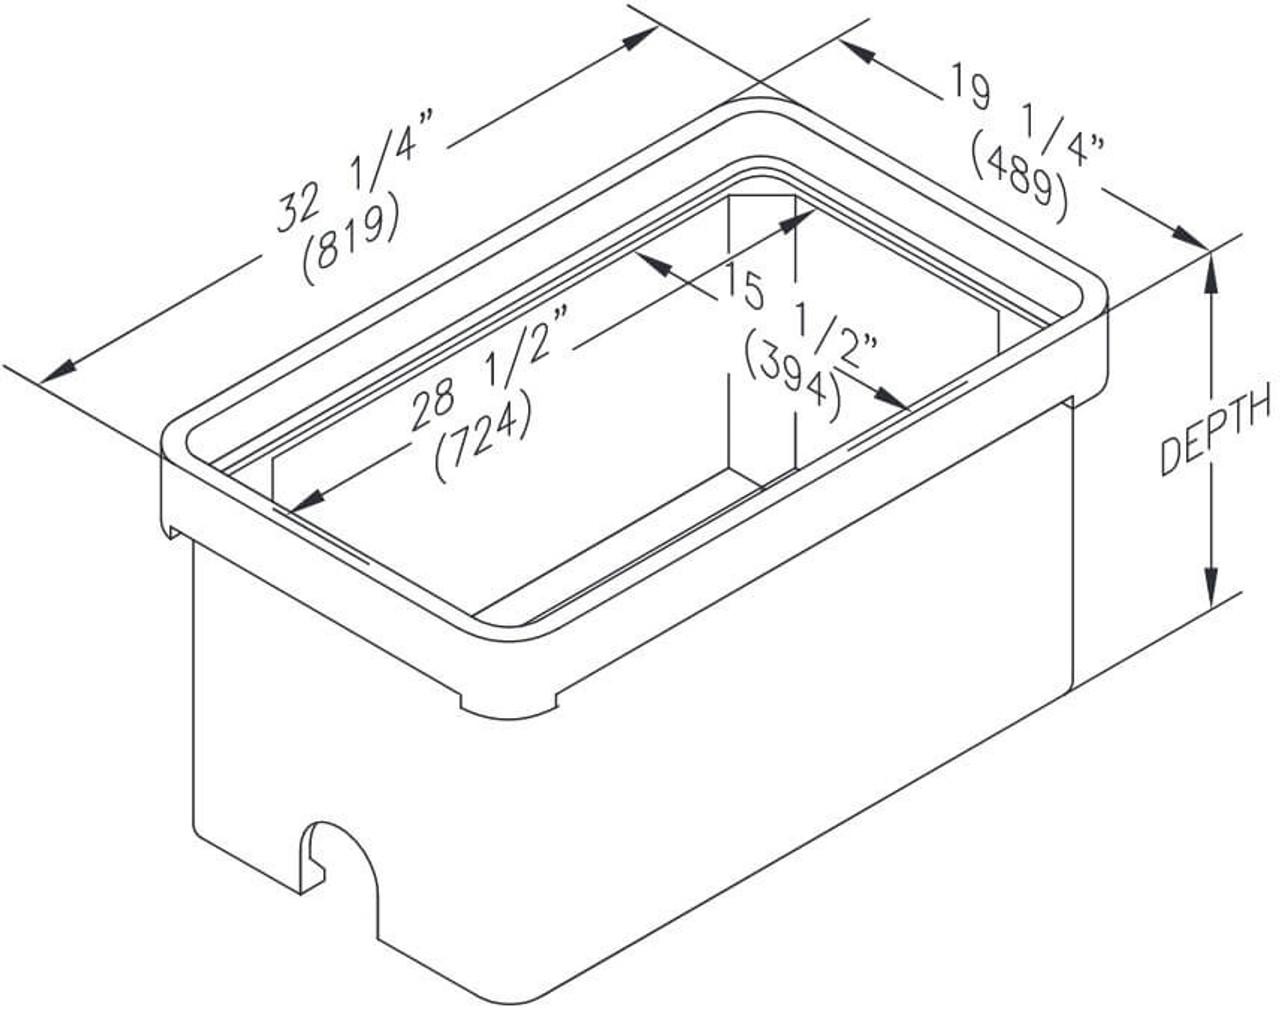 PG1730BA Quazite Box 17 X 30 - ANSI Tier 22